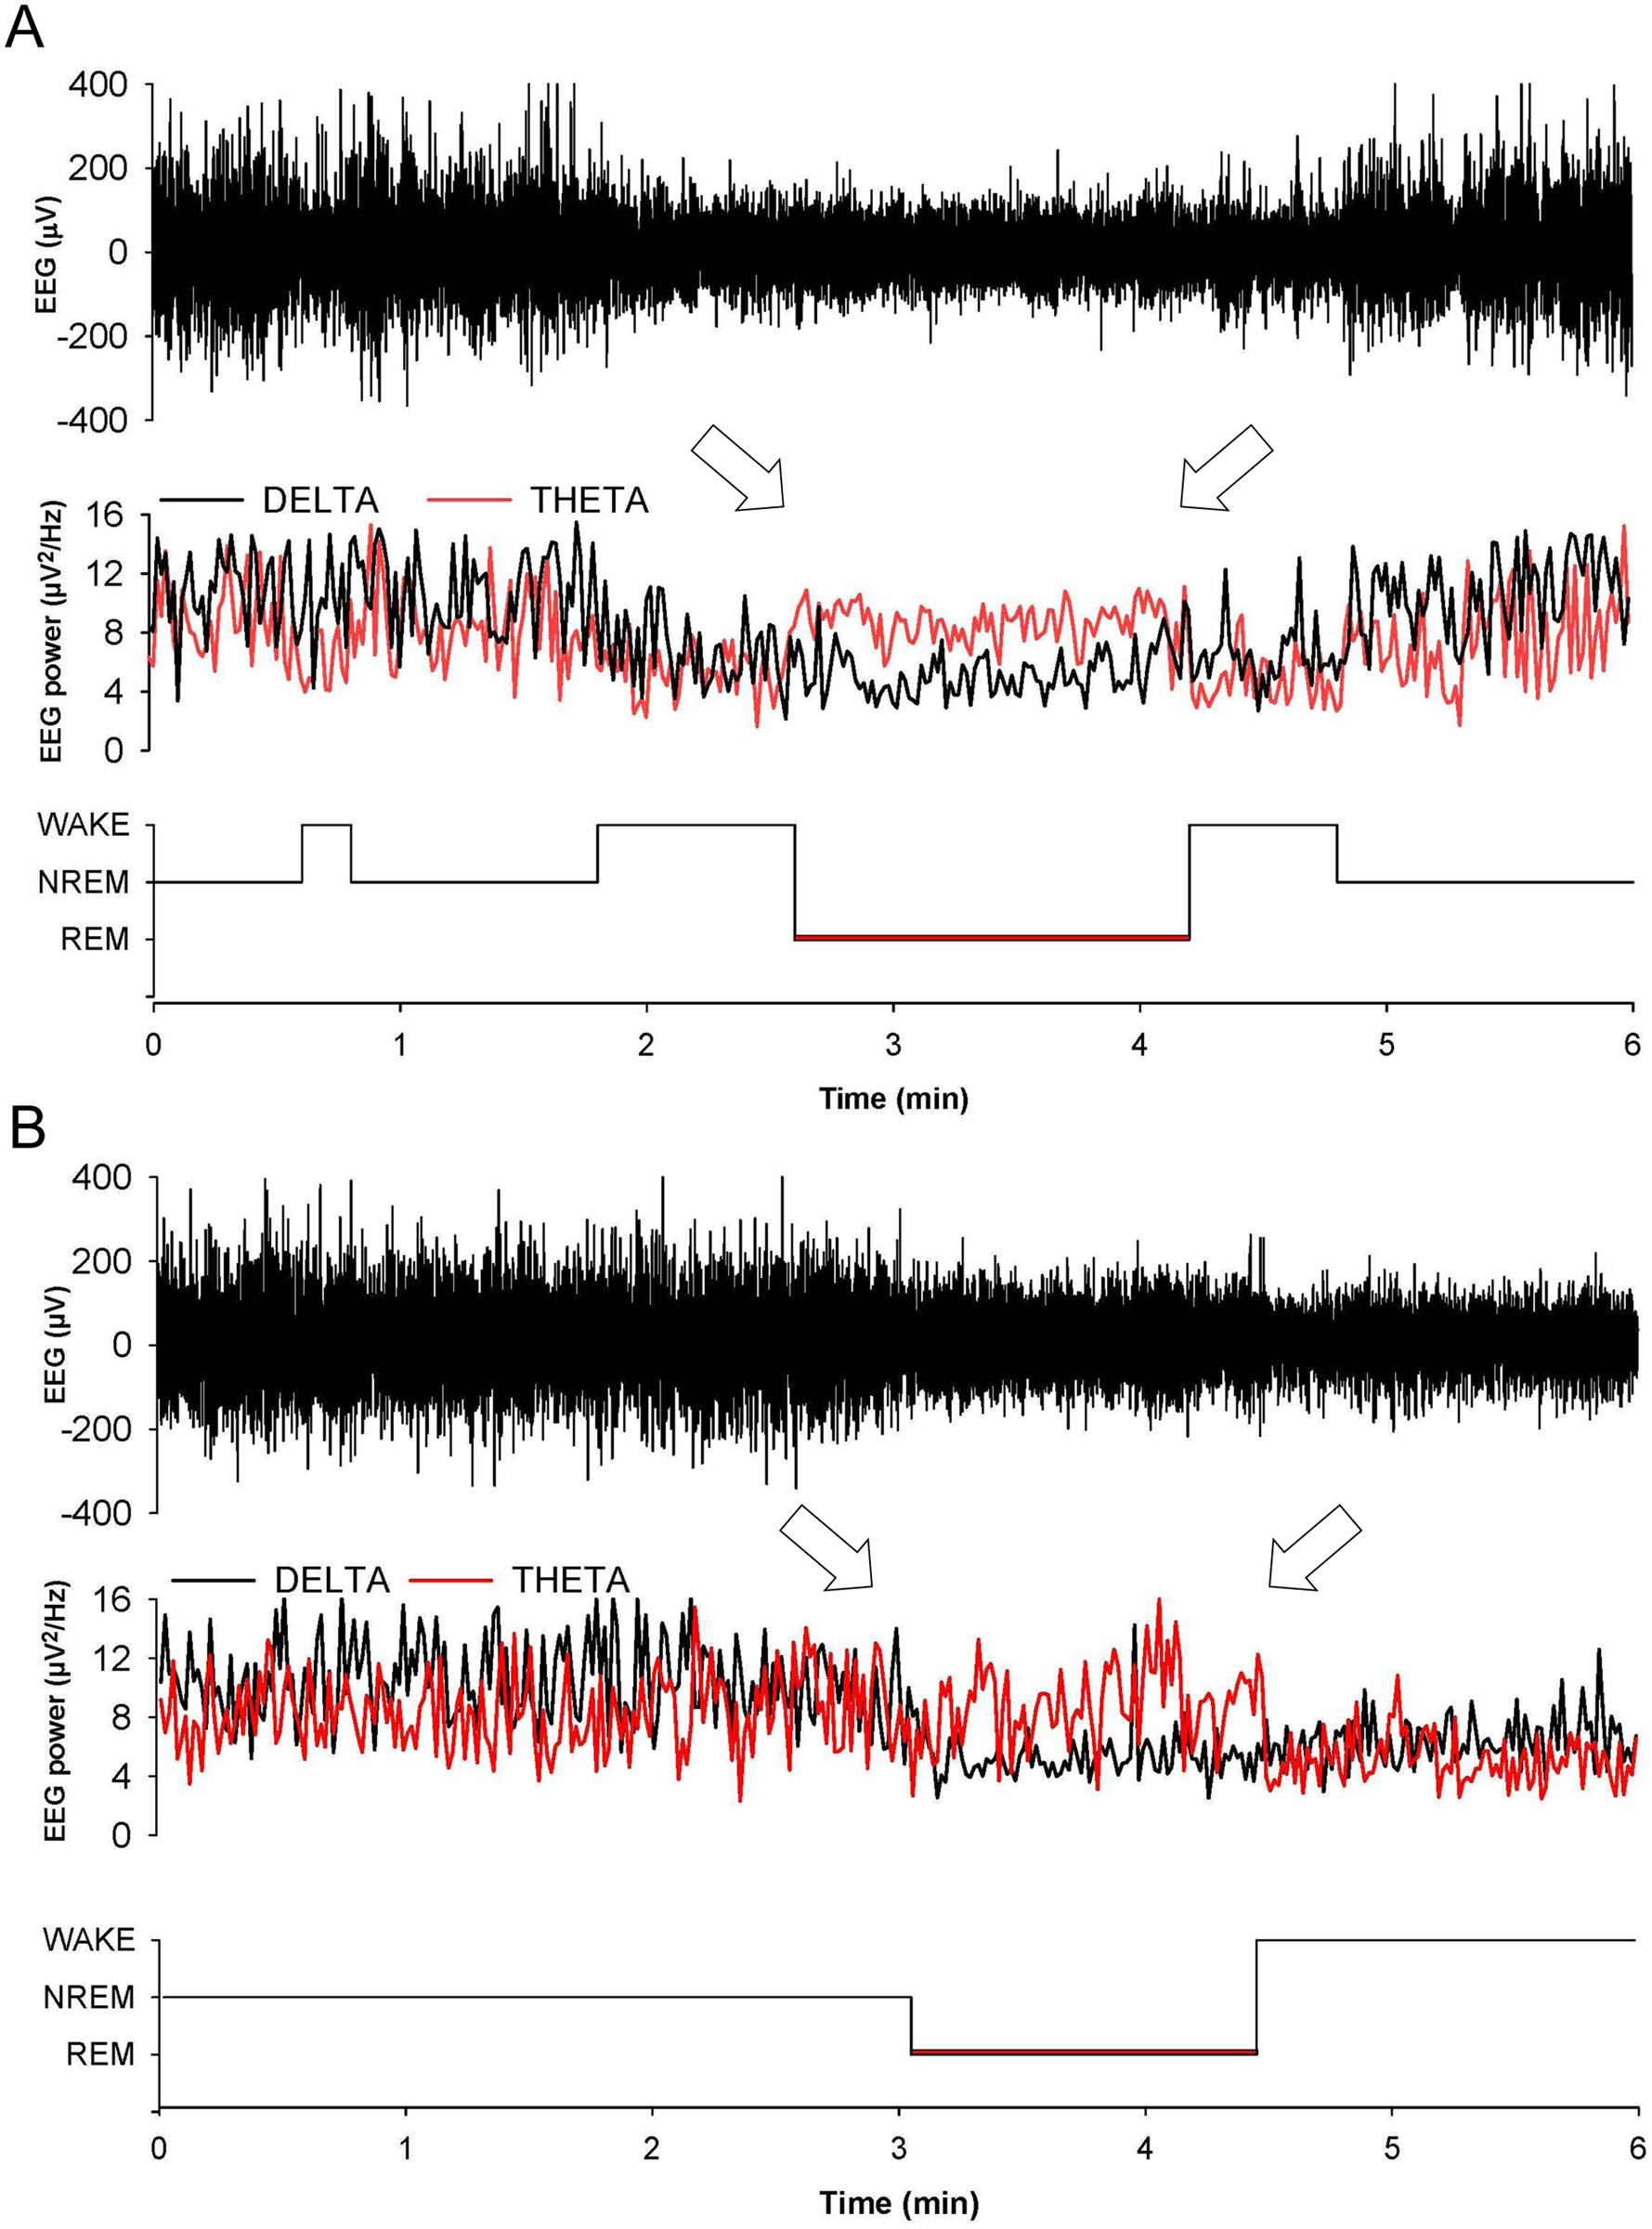 Entry in REM sleep is abnormal in Tg(FFI) mice.